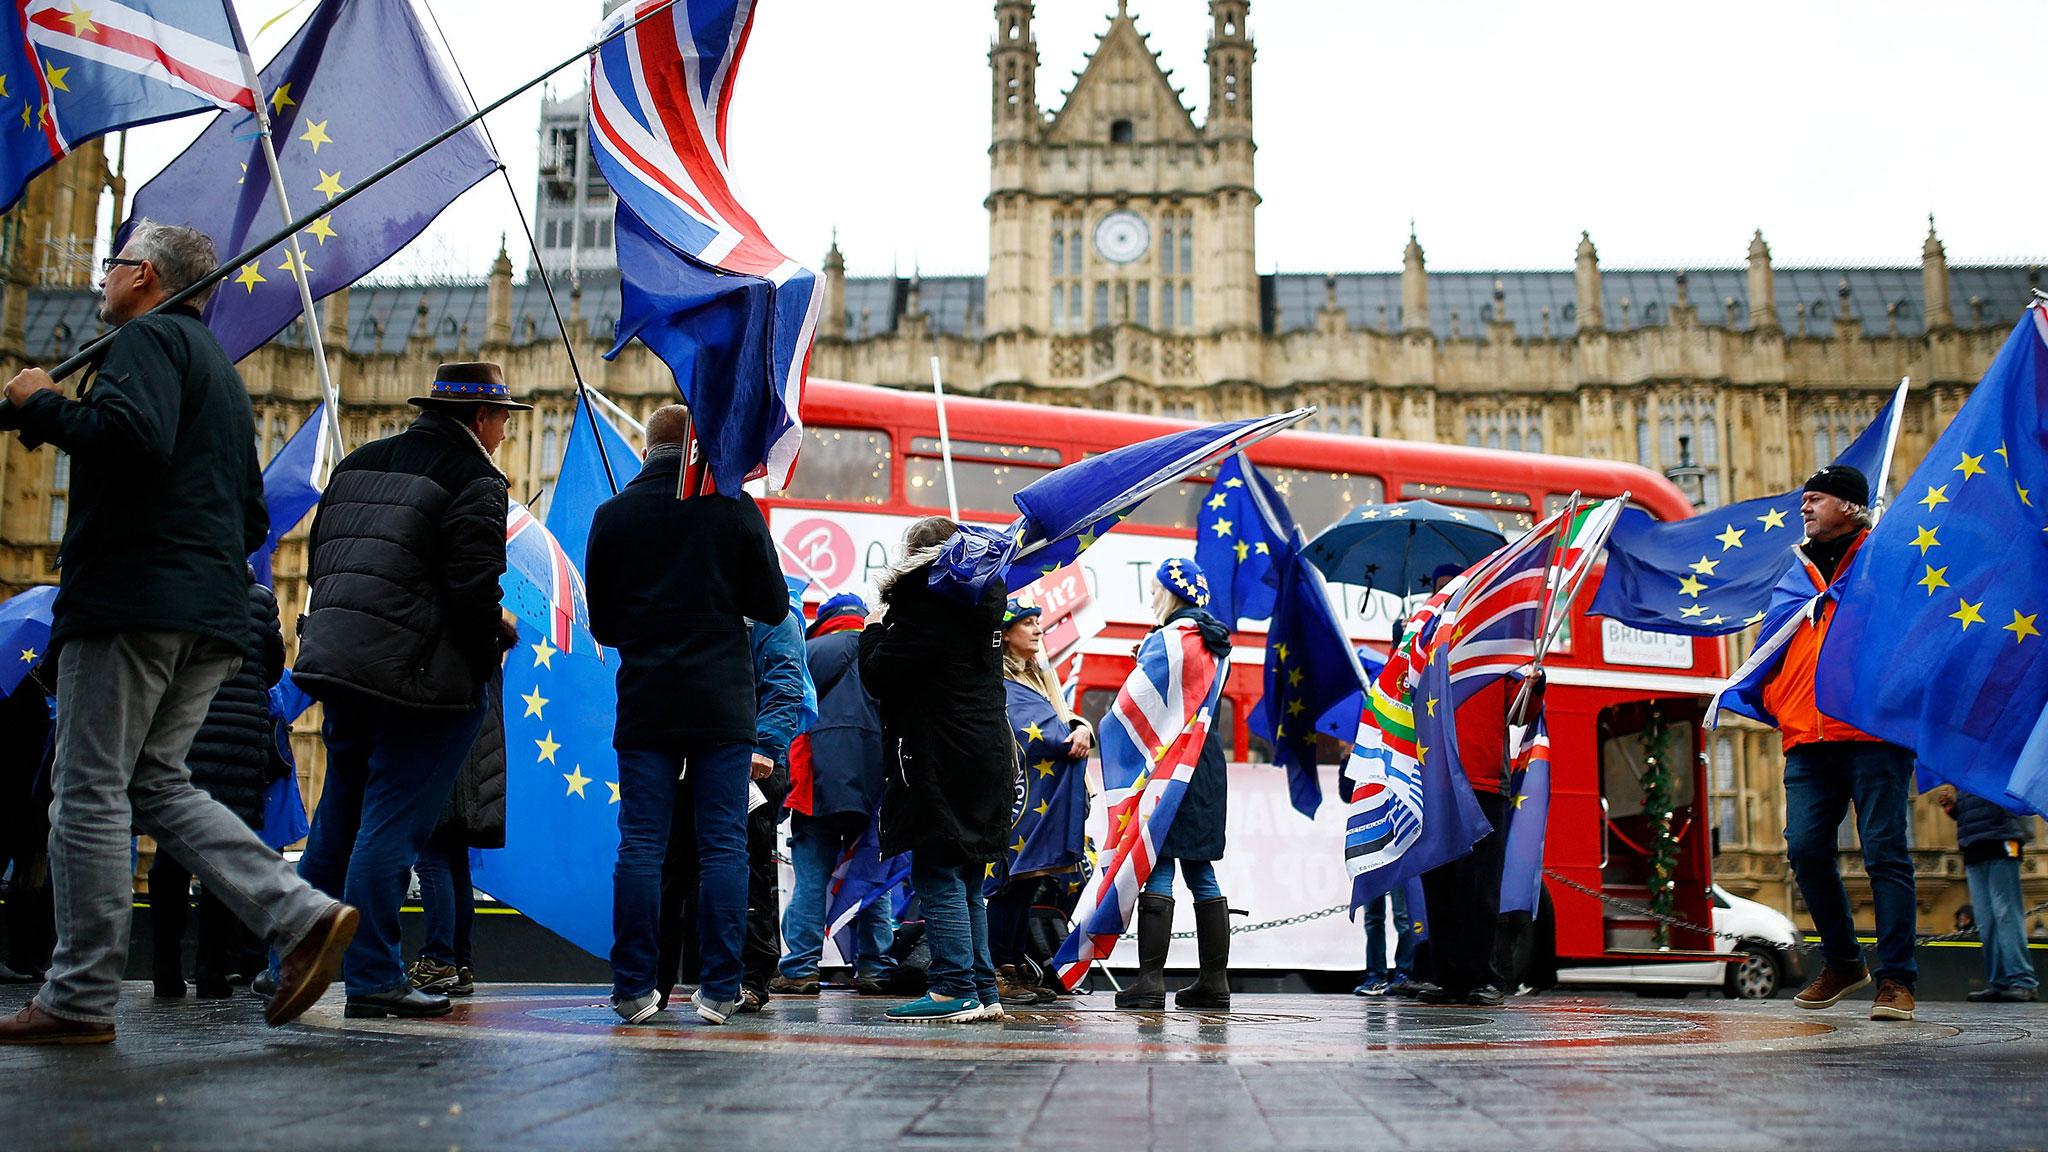 UK government loses contempt vote over Brexit legal advice